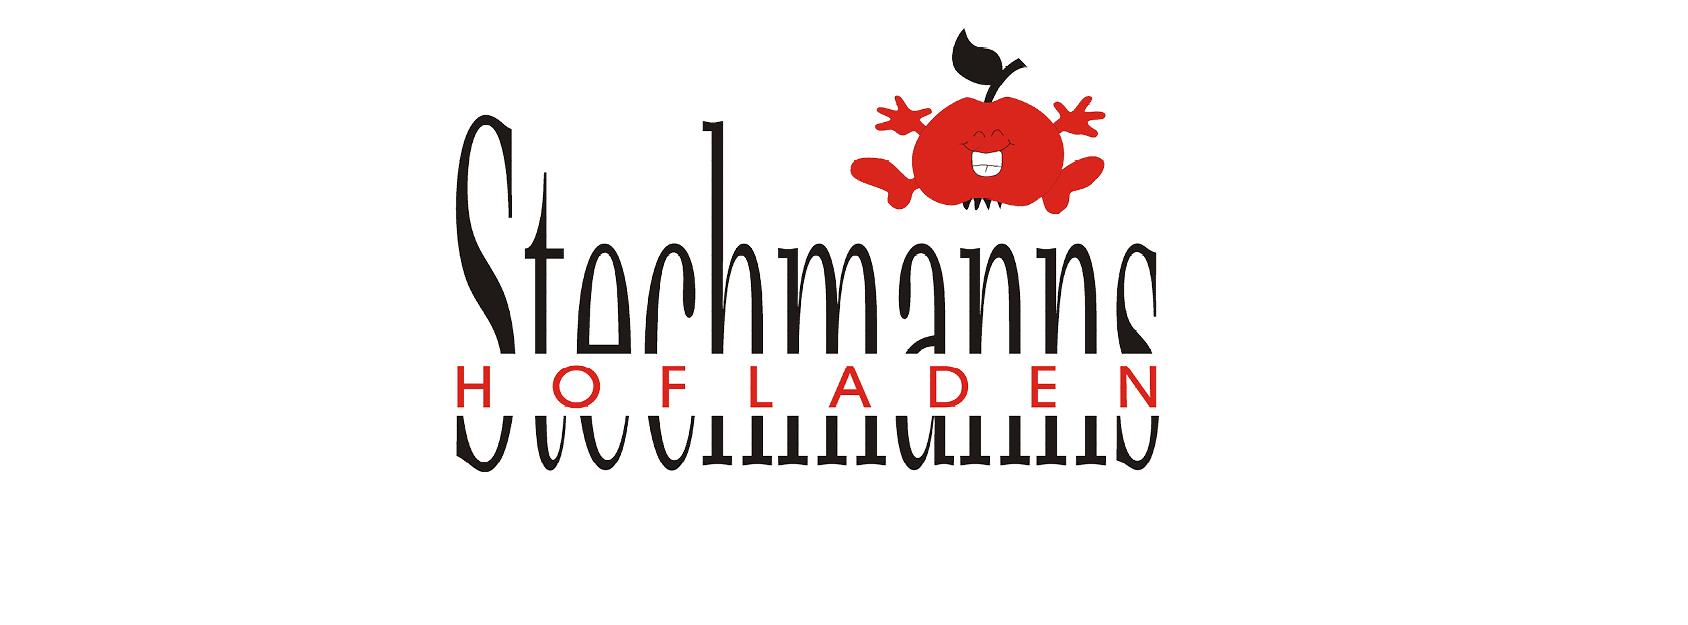 Logo Stechmanns